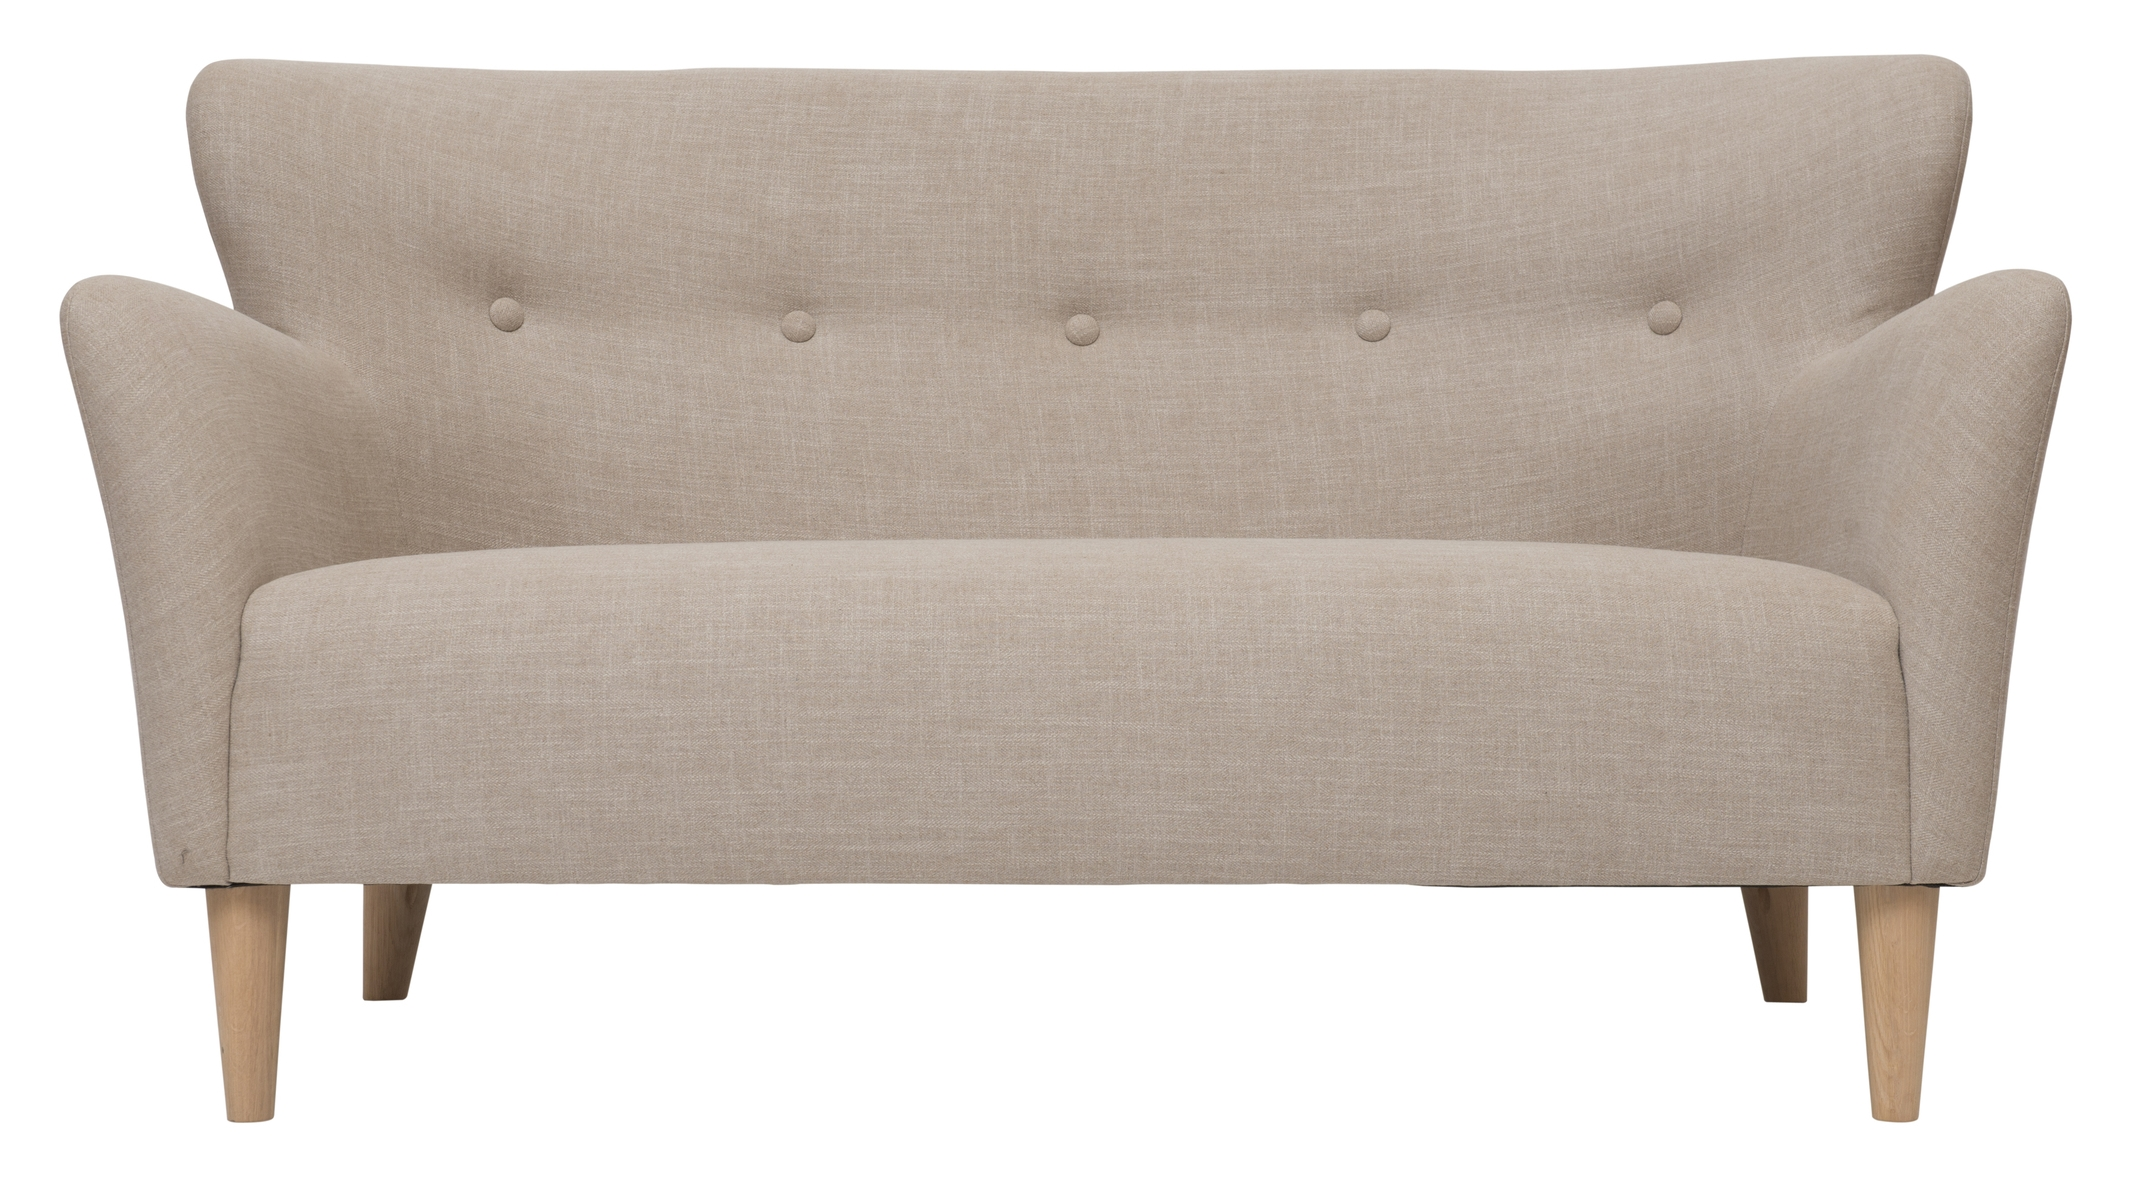 Large peggy sofa in skin beige